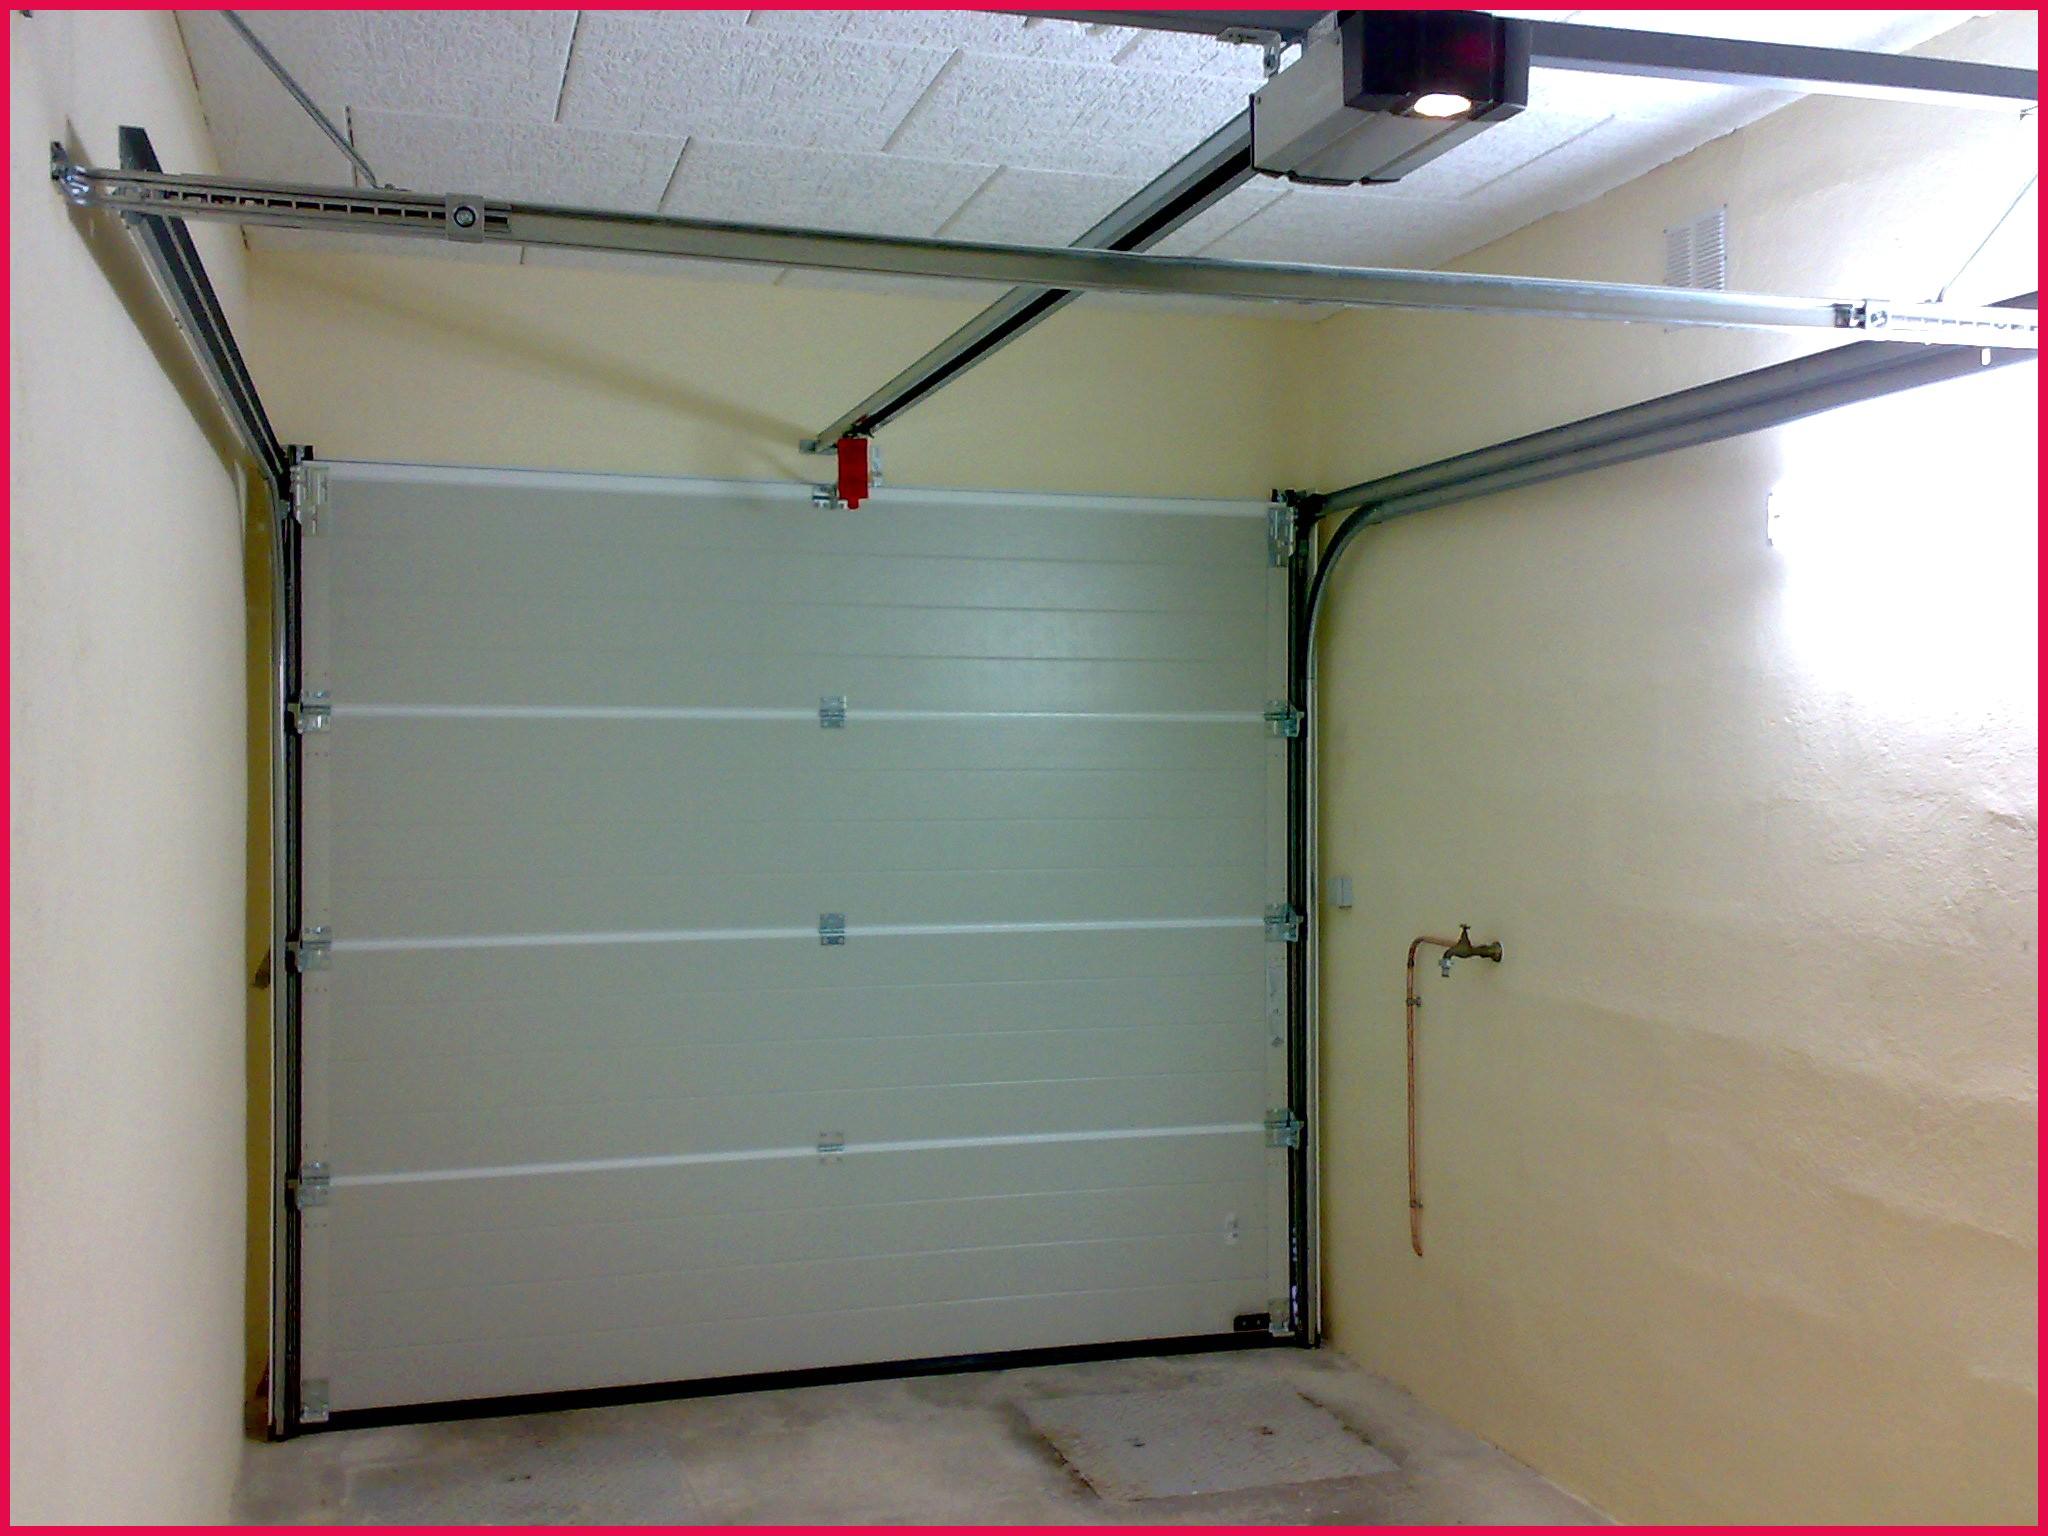 Montage porte de garage basculante electrique voiture moto et auto - Porte de garage electrique ...